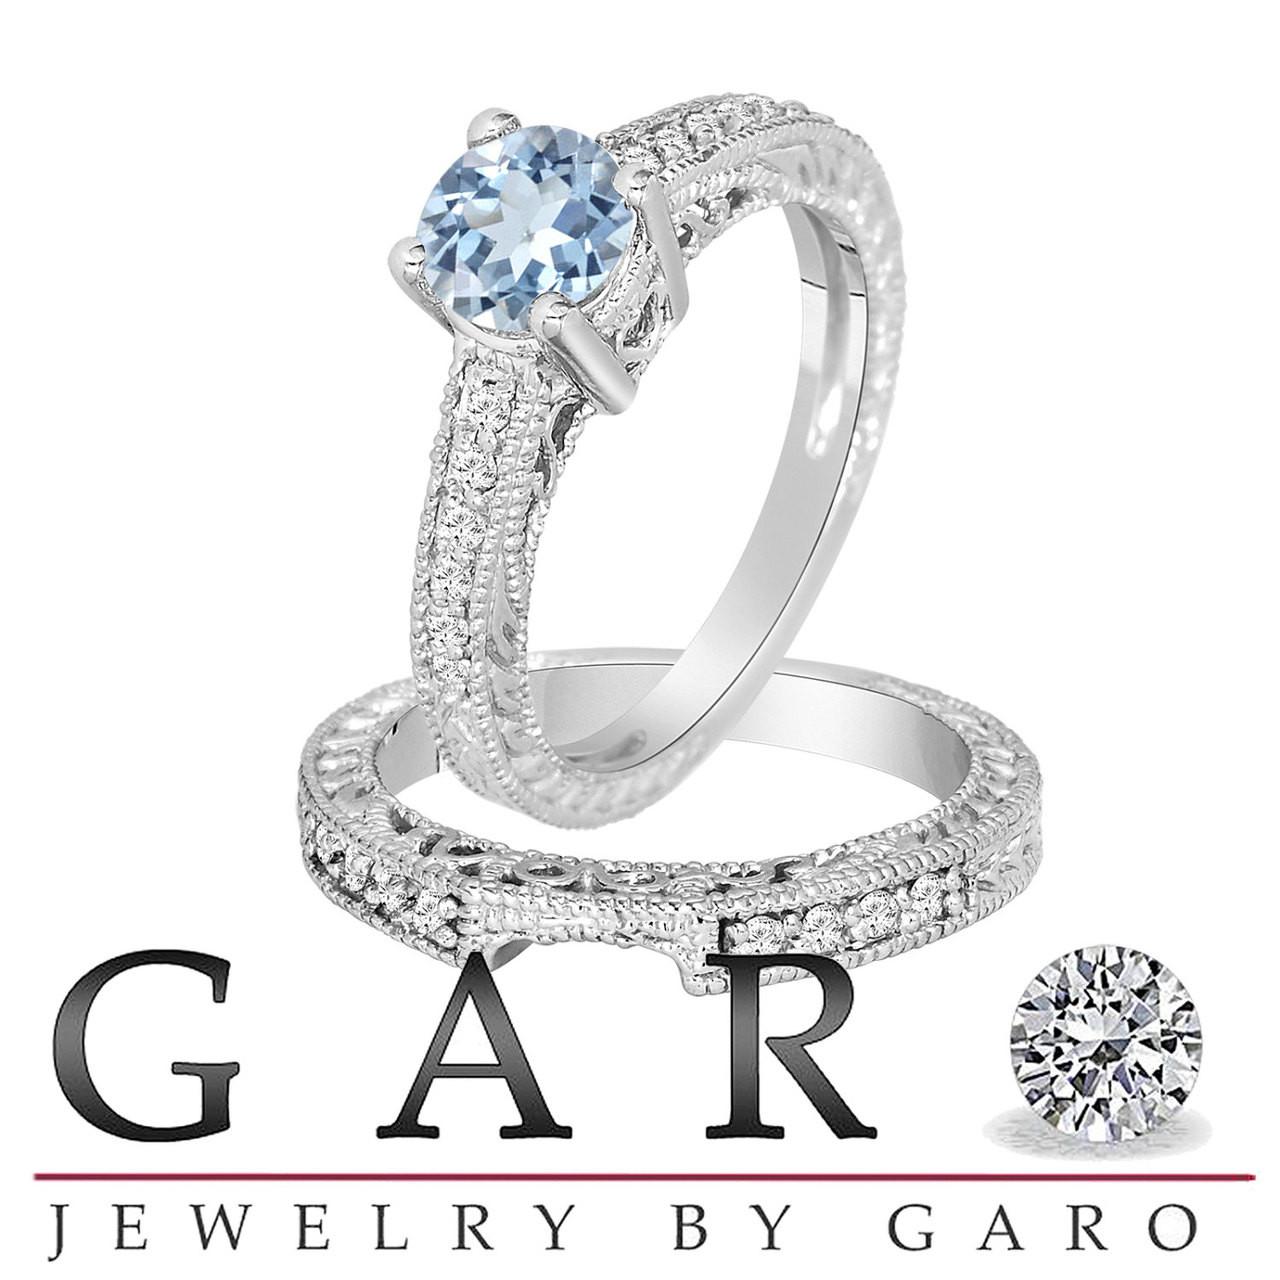 31c926e49 Aquamarine & Diamond Engagement Ring And Wedding Anniversary Diamond Band  Sets 14K White Gold 1.14 Carat. Larger / More Photos